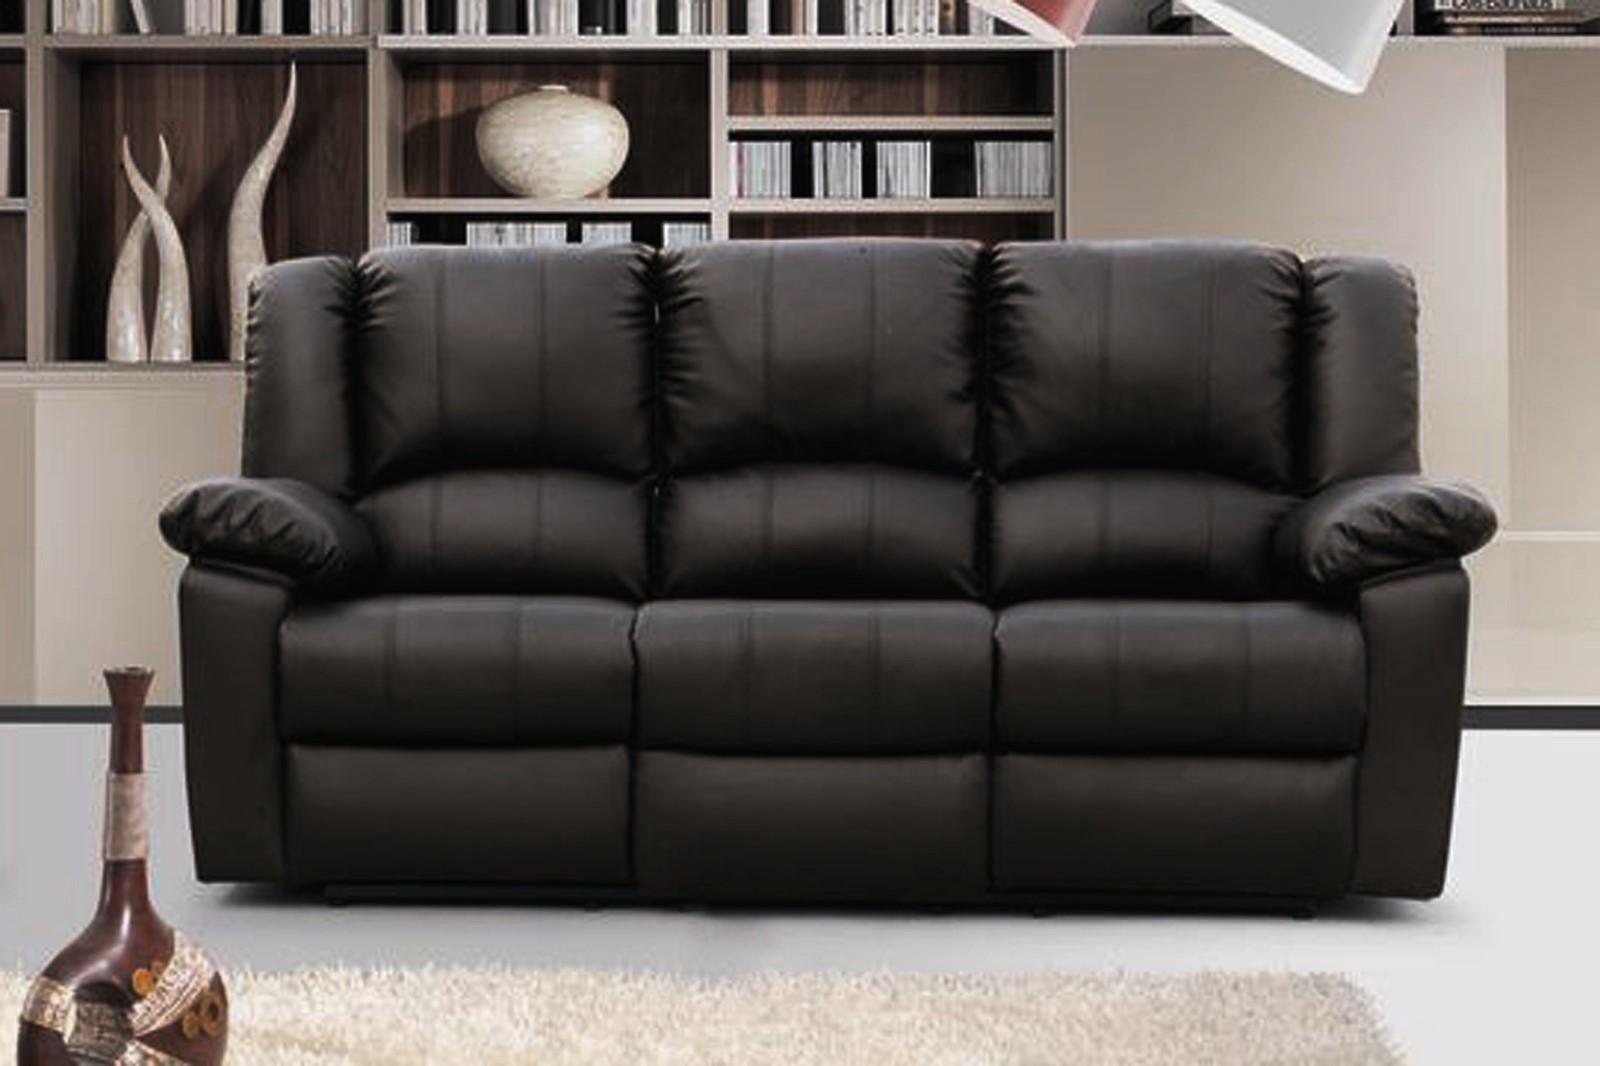 Sofa Ideas 3 Seater Leather Sofas Explore Of 20 Photos & 3 seater leather sofa recliner | Centerfieldbar.com islam-shia.org